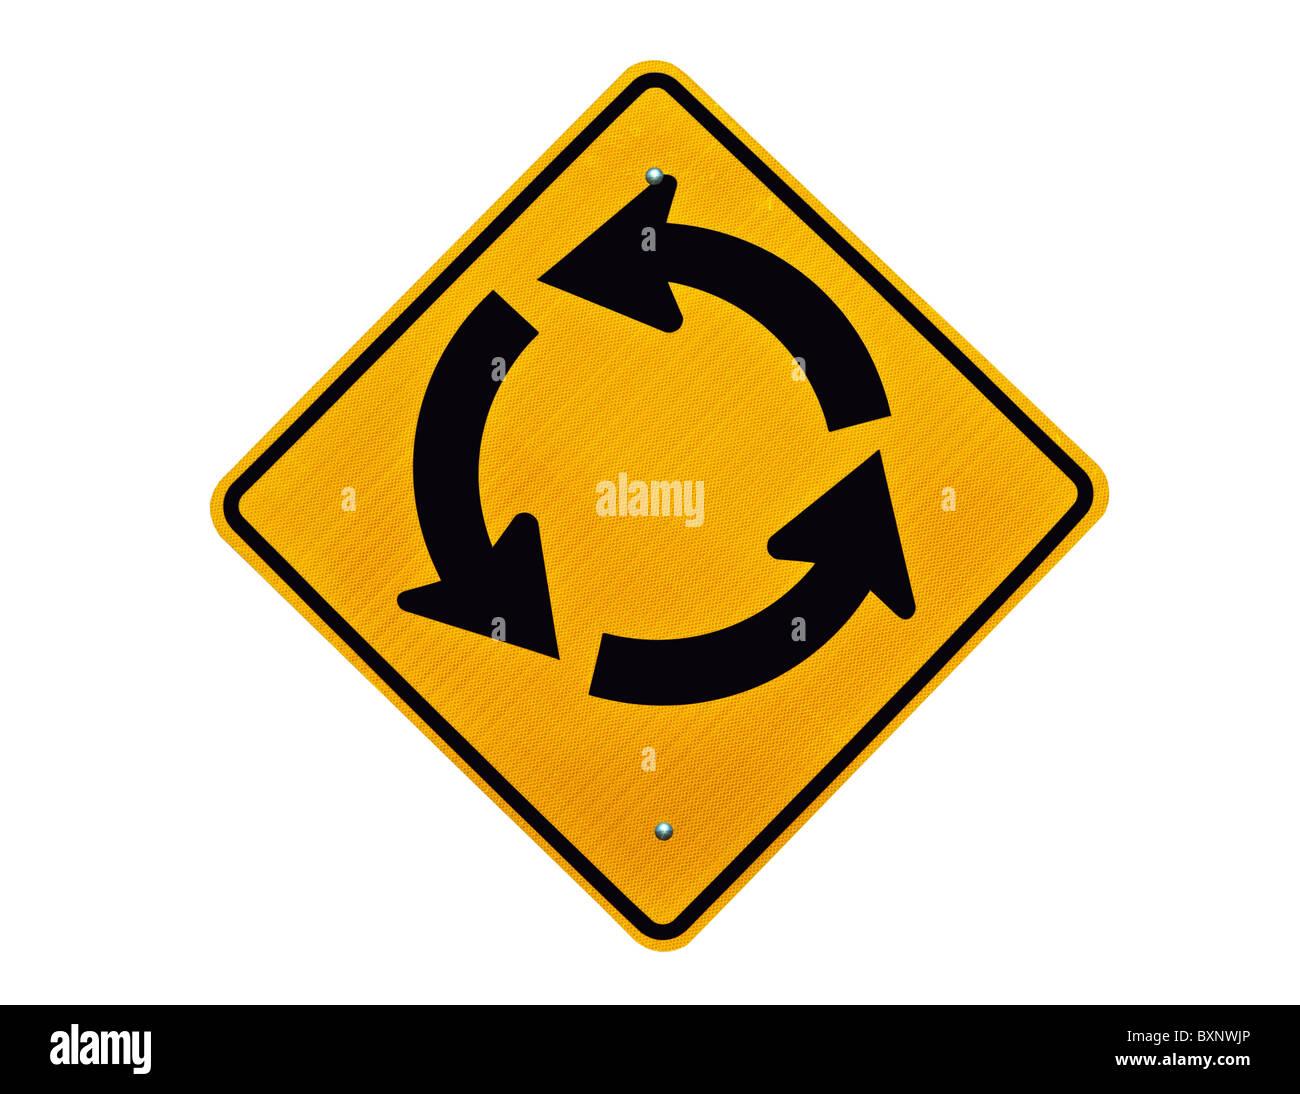 Endless traffic circle loop caution sign. - Stock Image